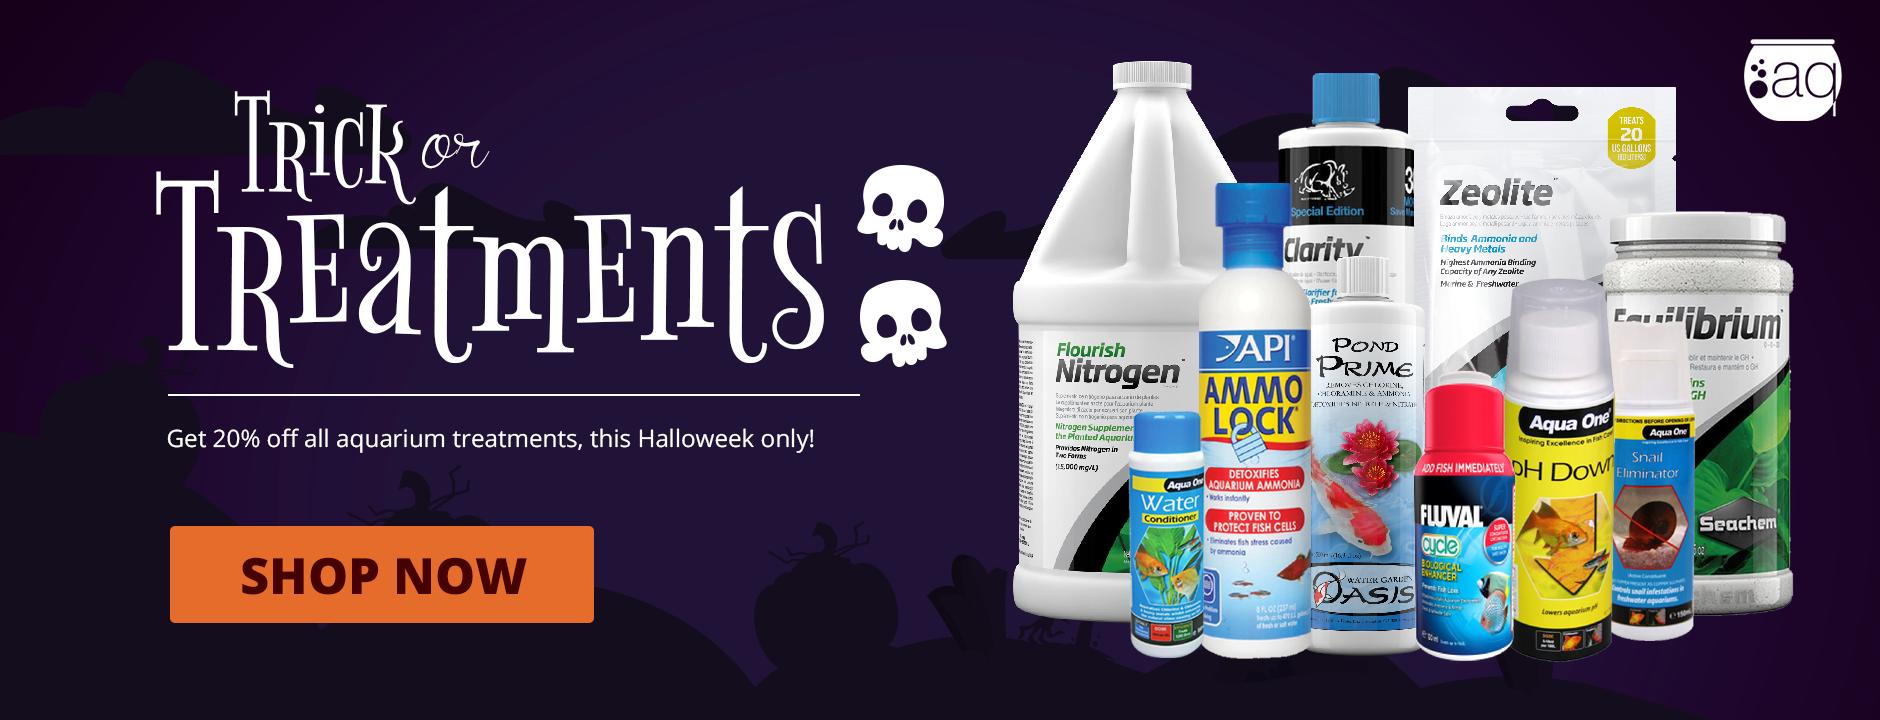 halloweek-treatments-banner.png